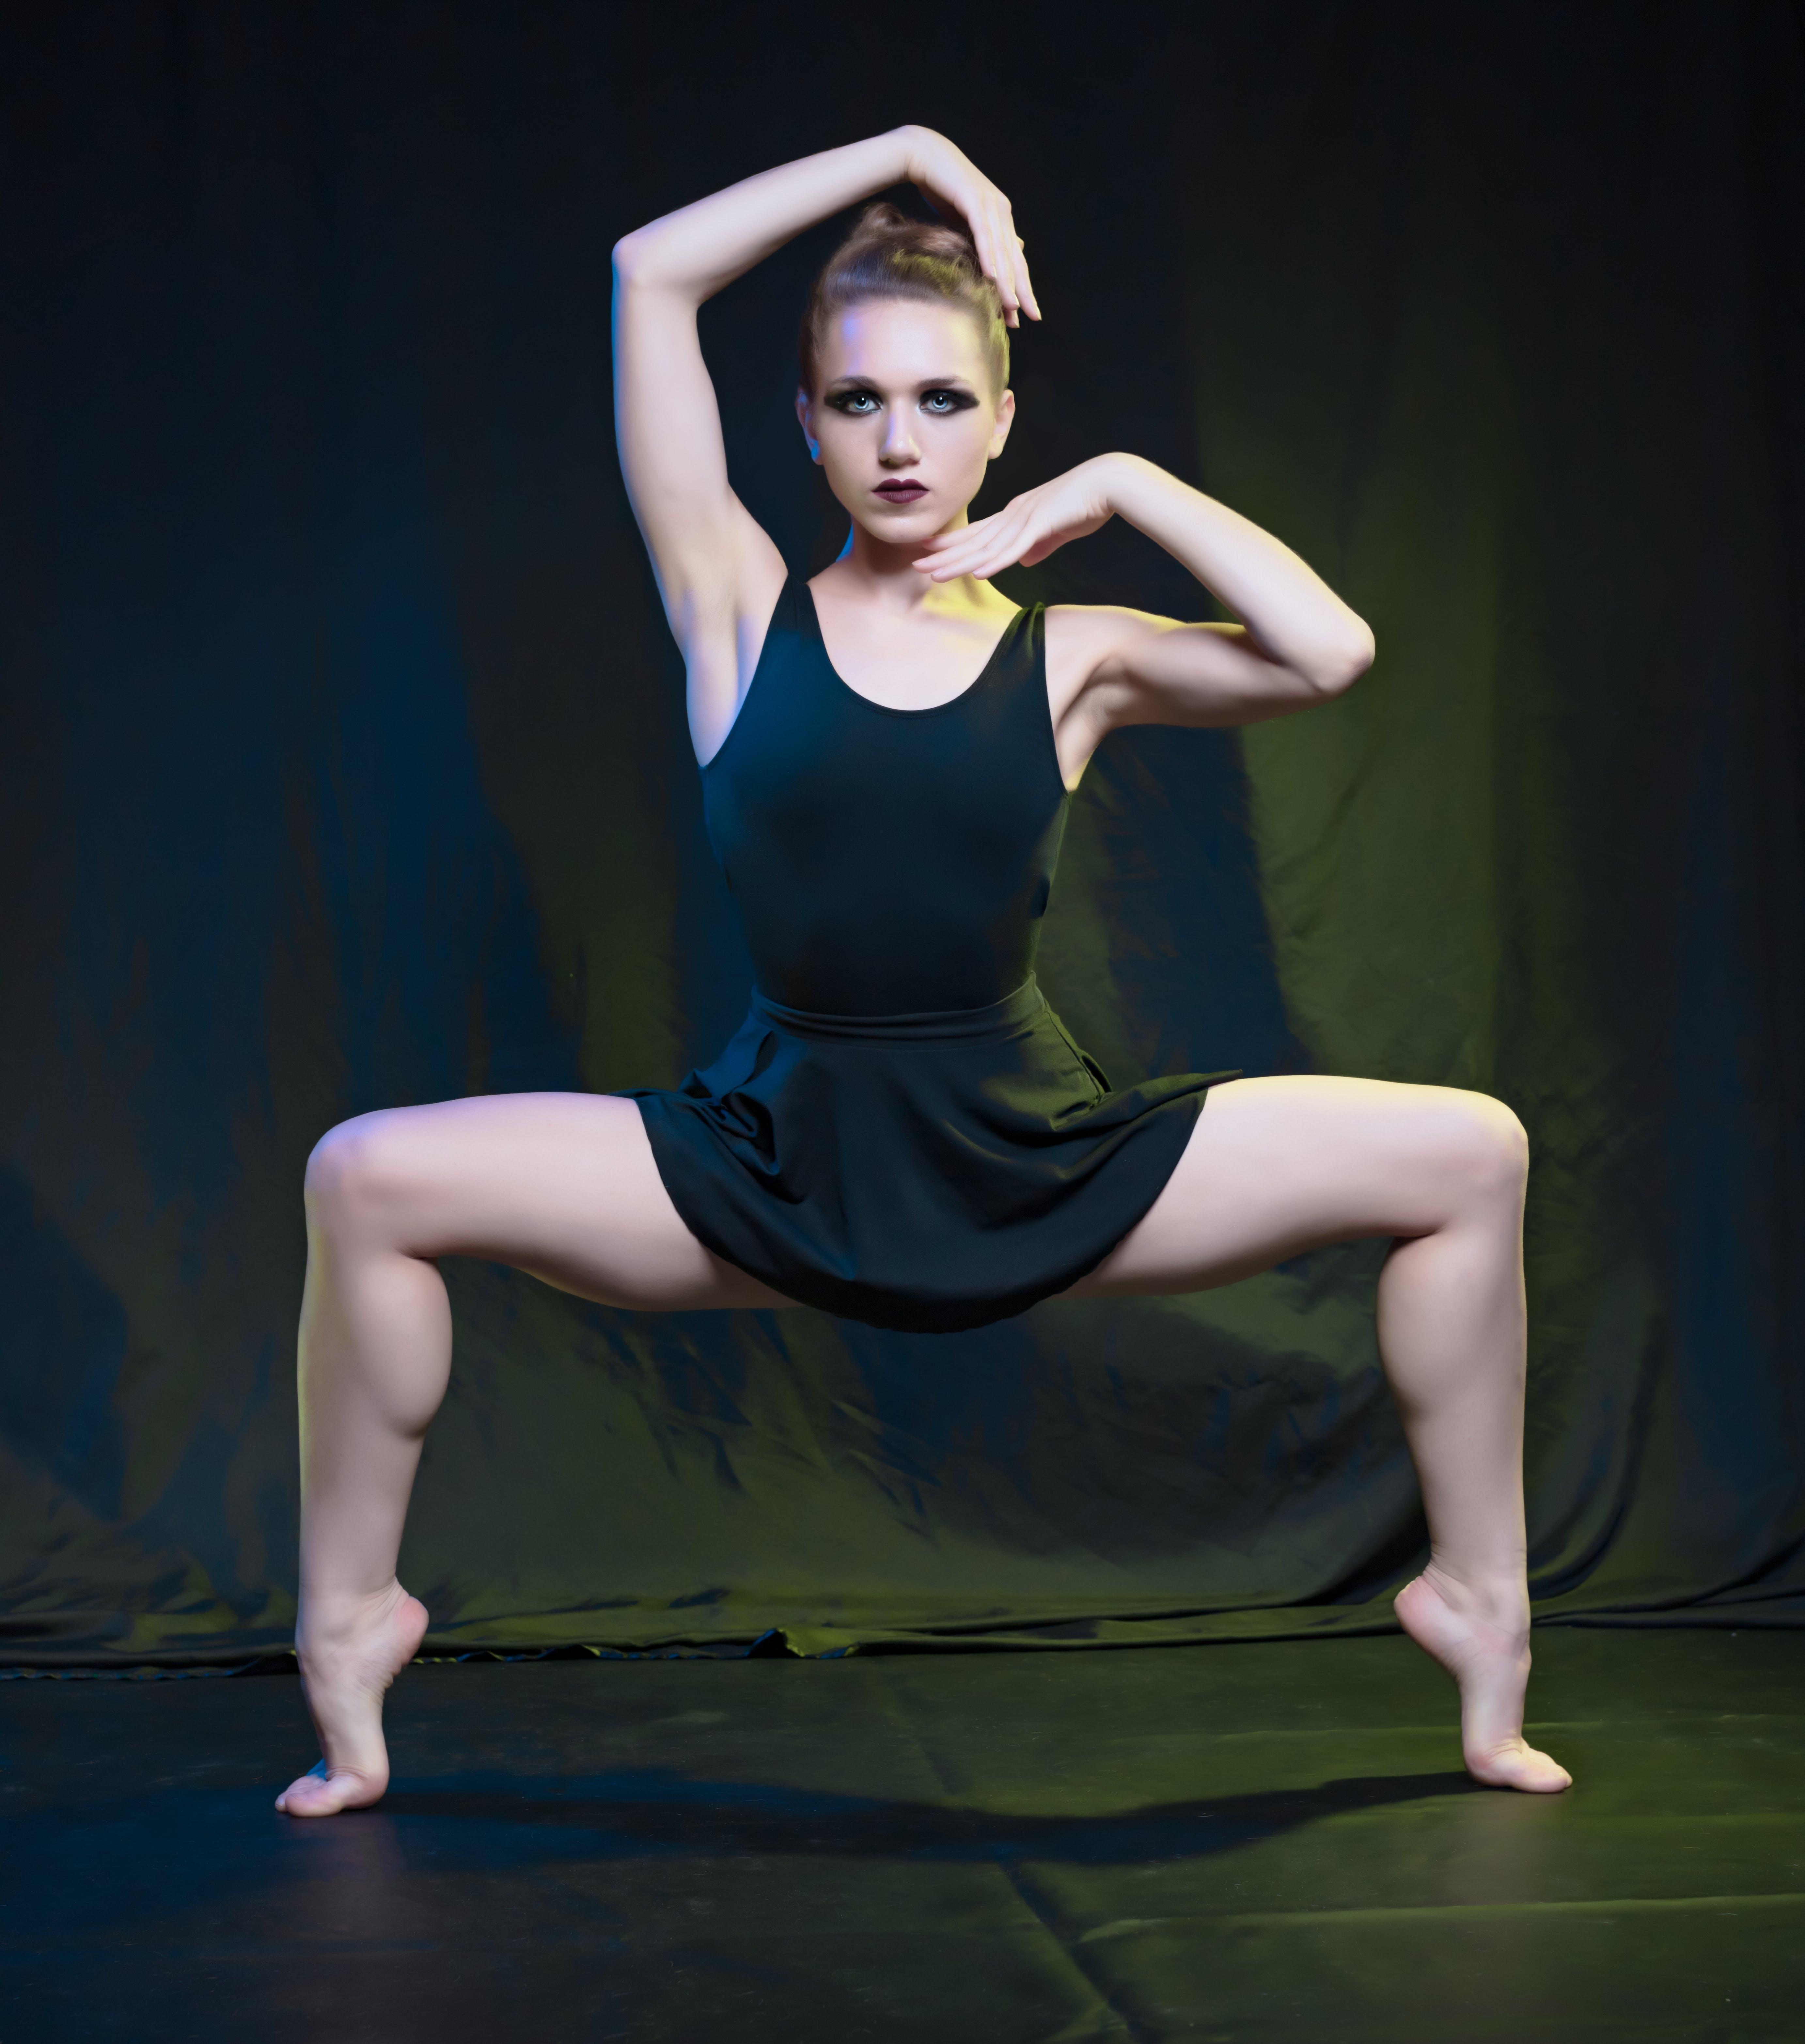 Free stock photo of Classical dancer, dance, jazz